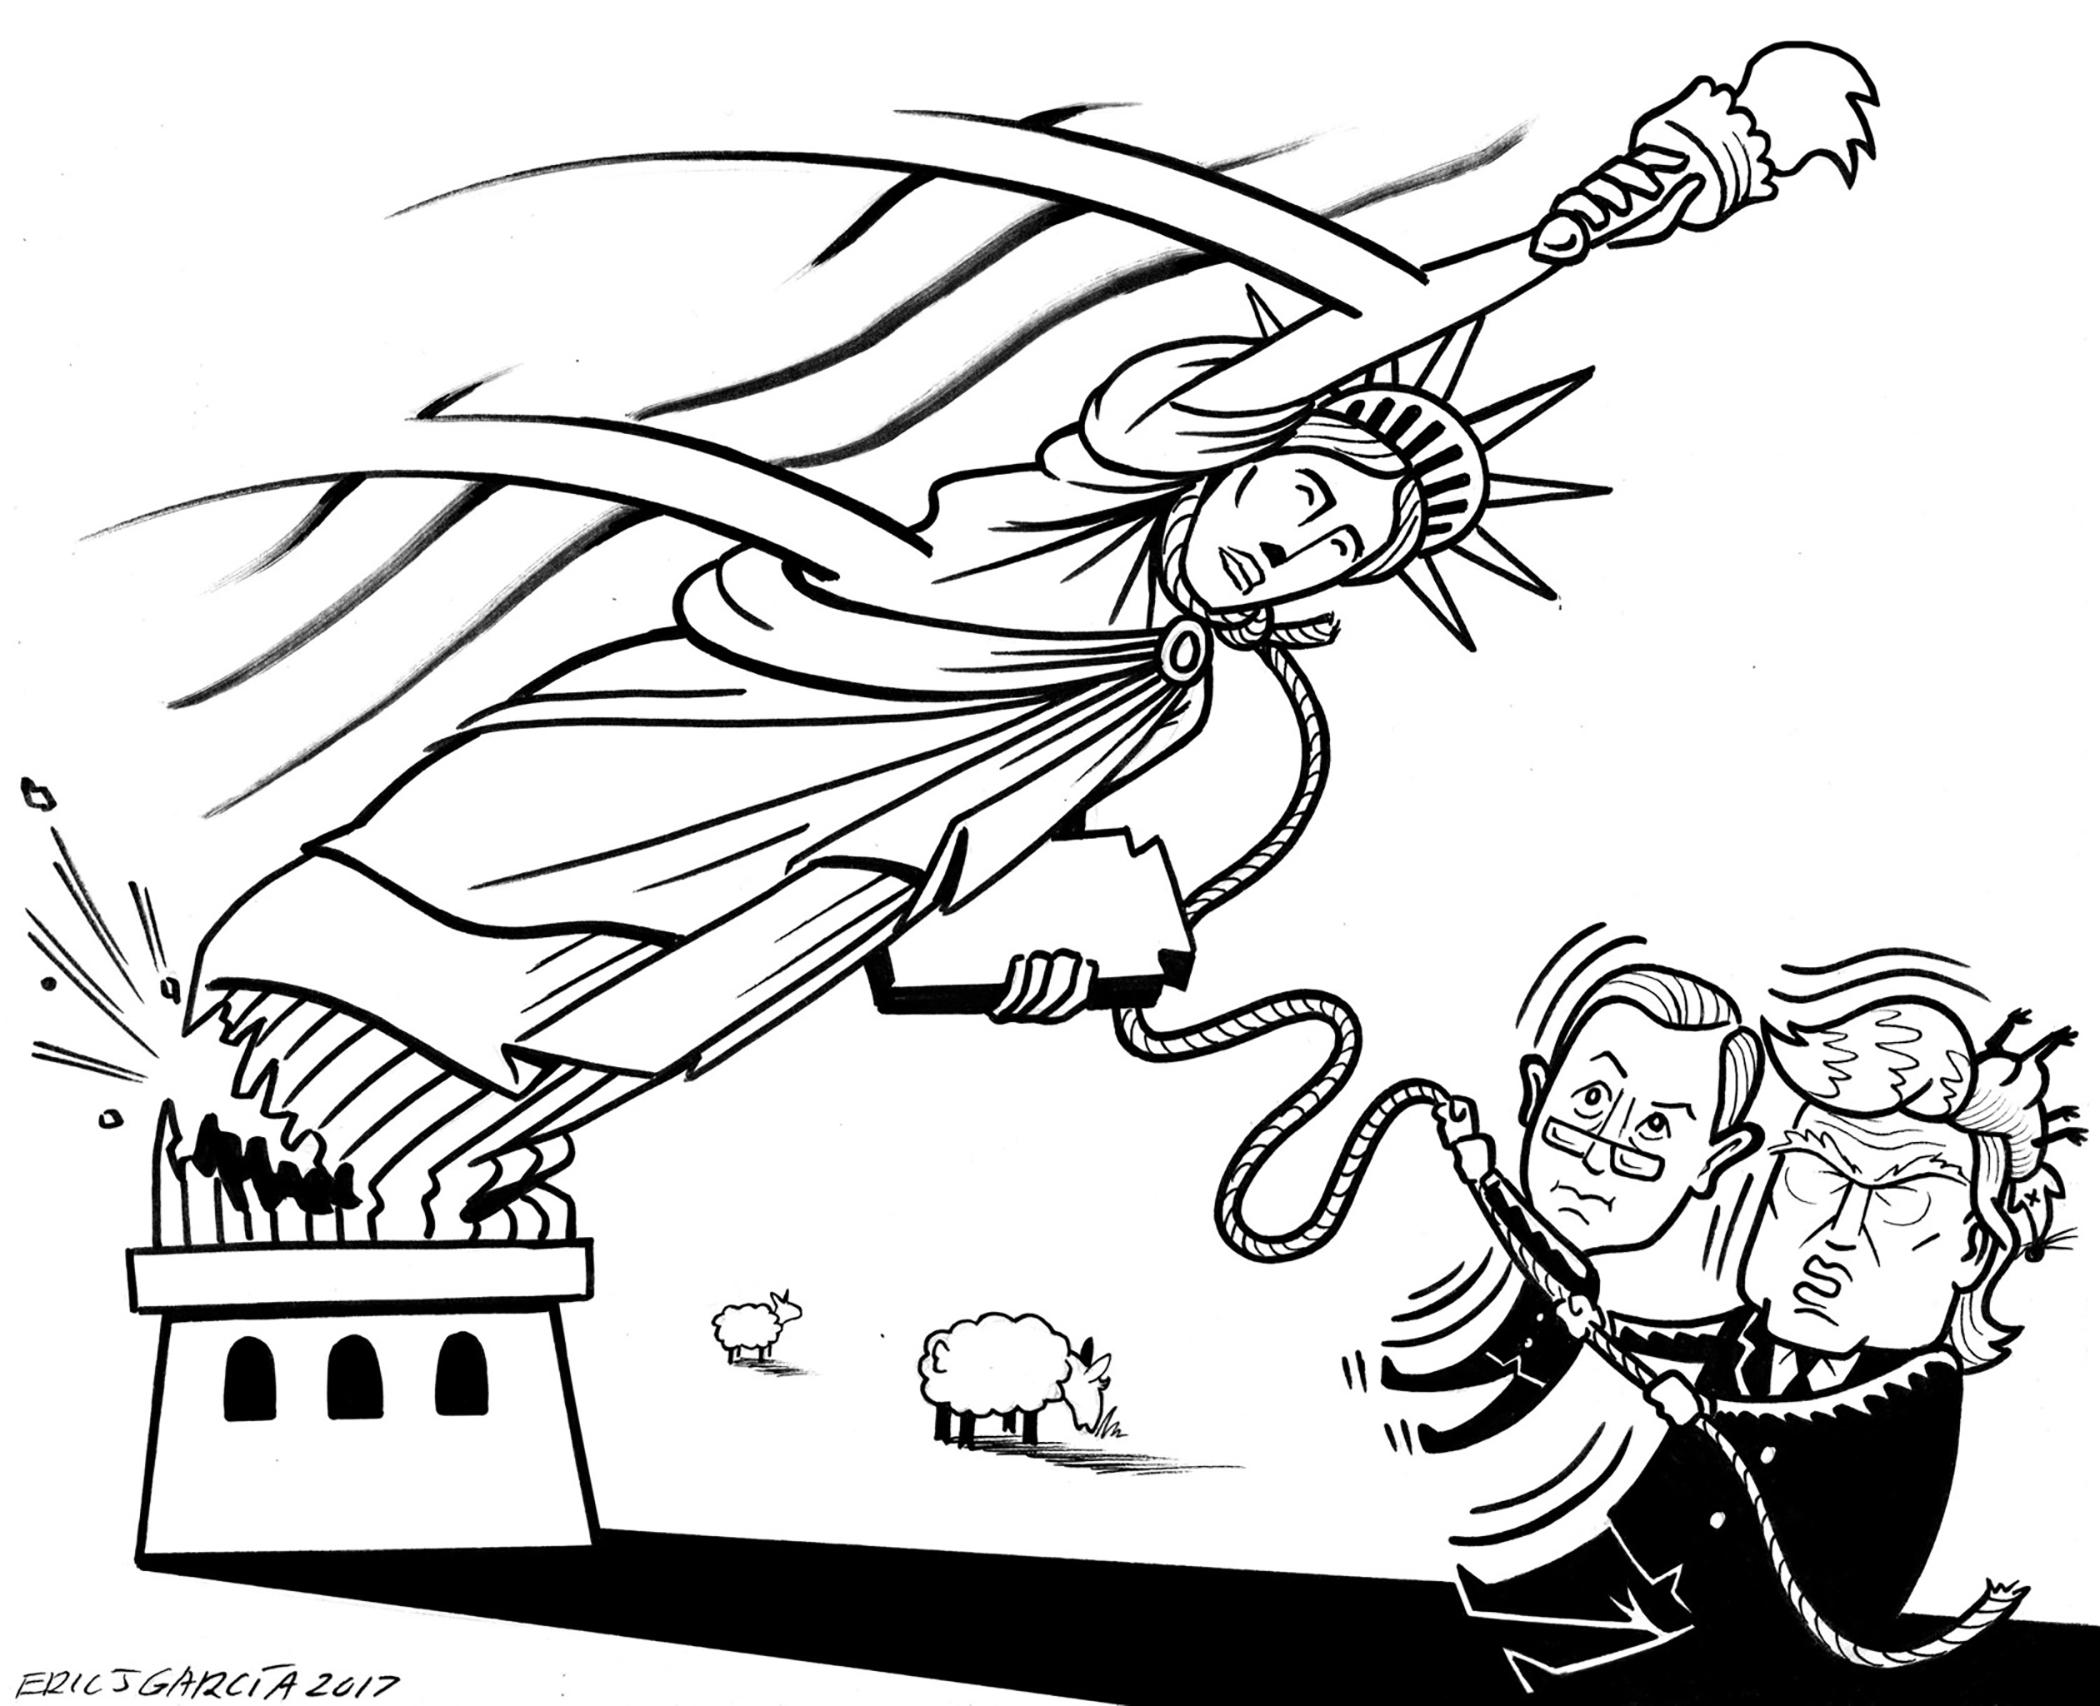 Eric J. Garcia,  Drawing on Anger,  pg. 180.